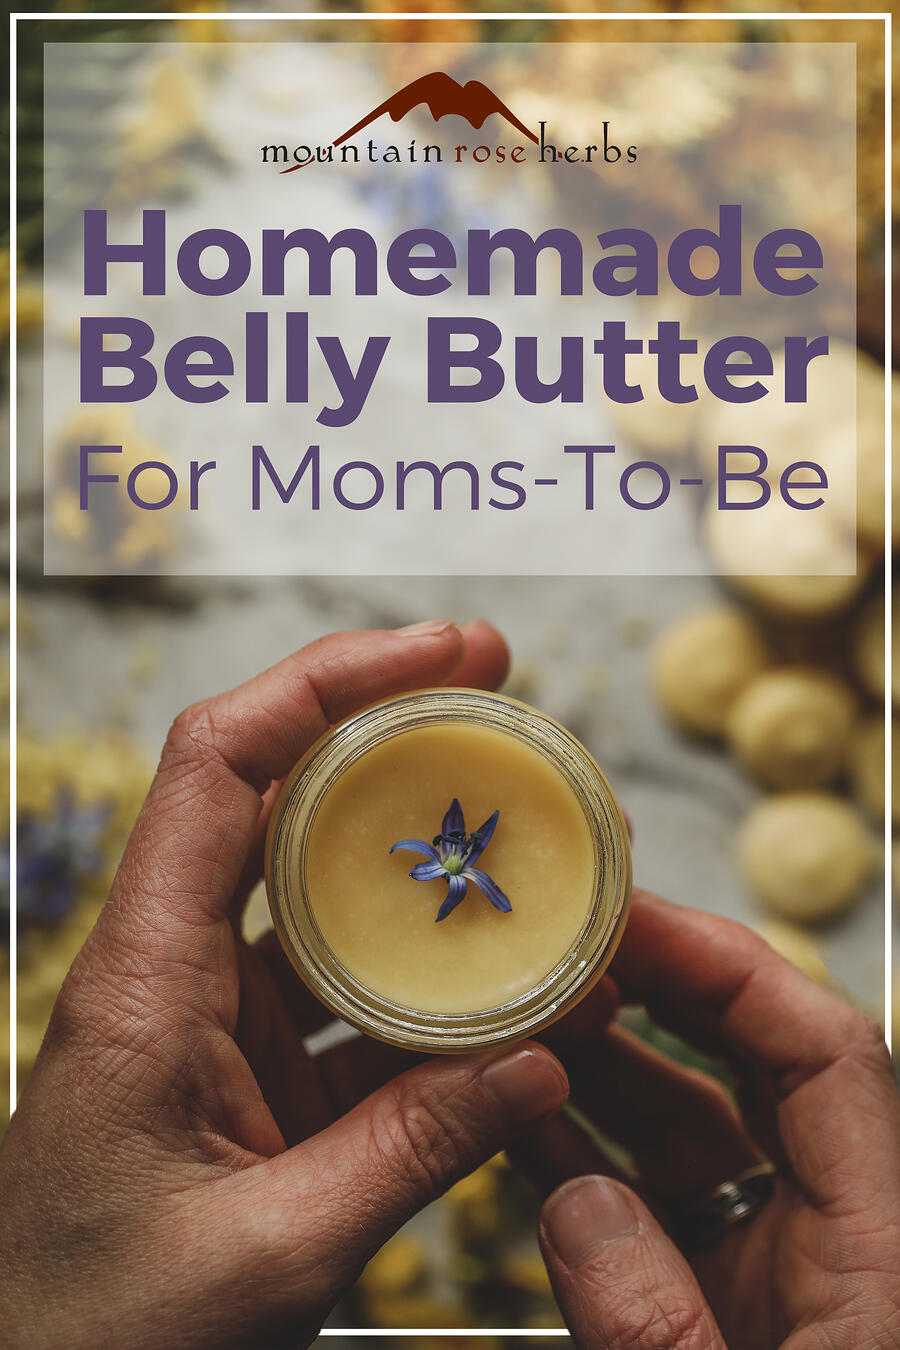 Mama's Homemade Belly Butter blog Pinterest pin for Mountain Rose Herbs.